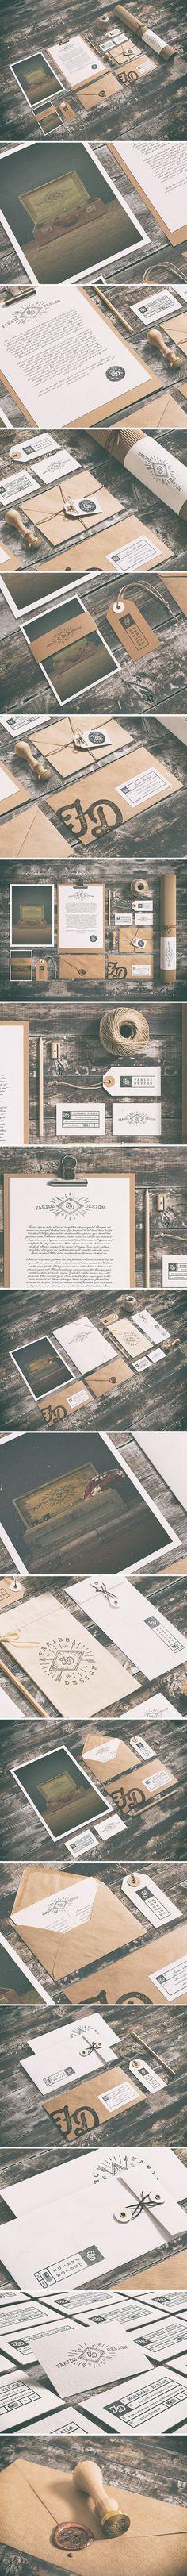 Retro Self ReBranding By Faridz Design Suite Brand Identity Design, Corporate Design, Graphic Design Typography, Business Design, Branding Design, Self Branding, Identity Branding, Corporate Identity, Packaging Design Inspiration